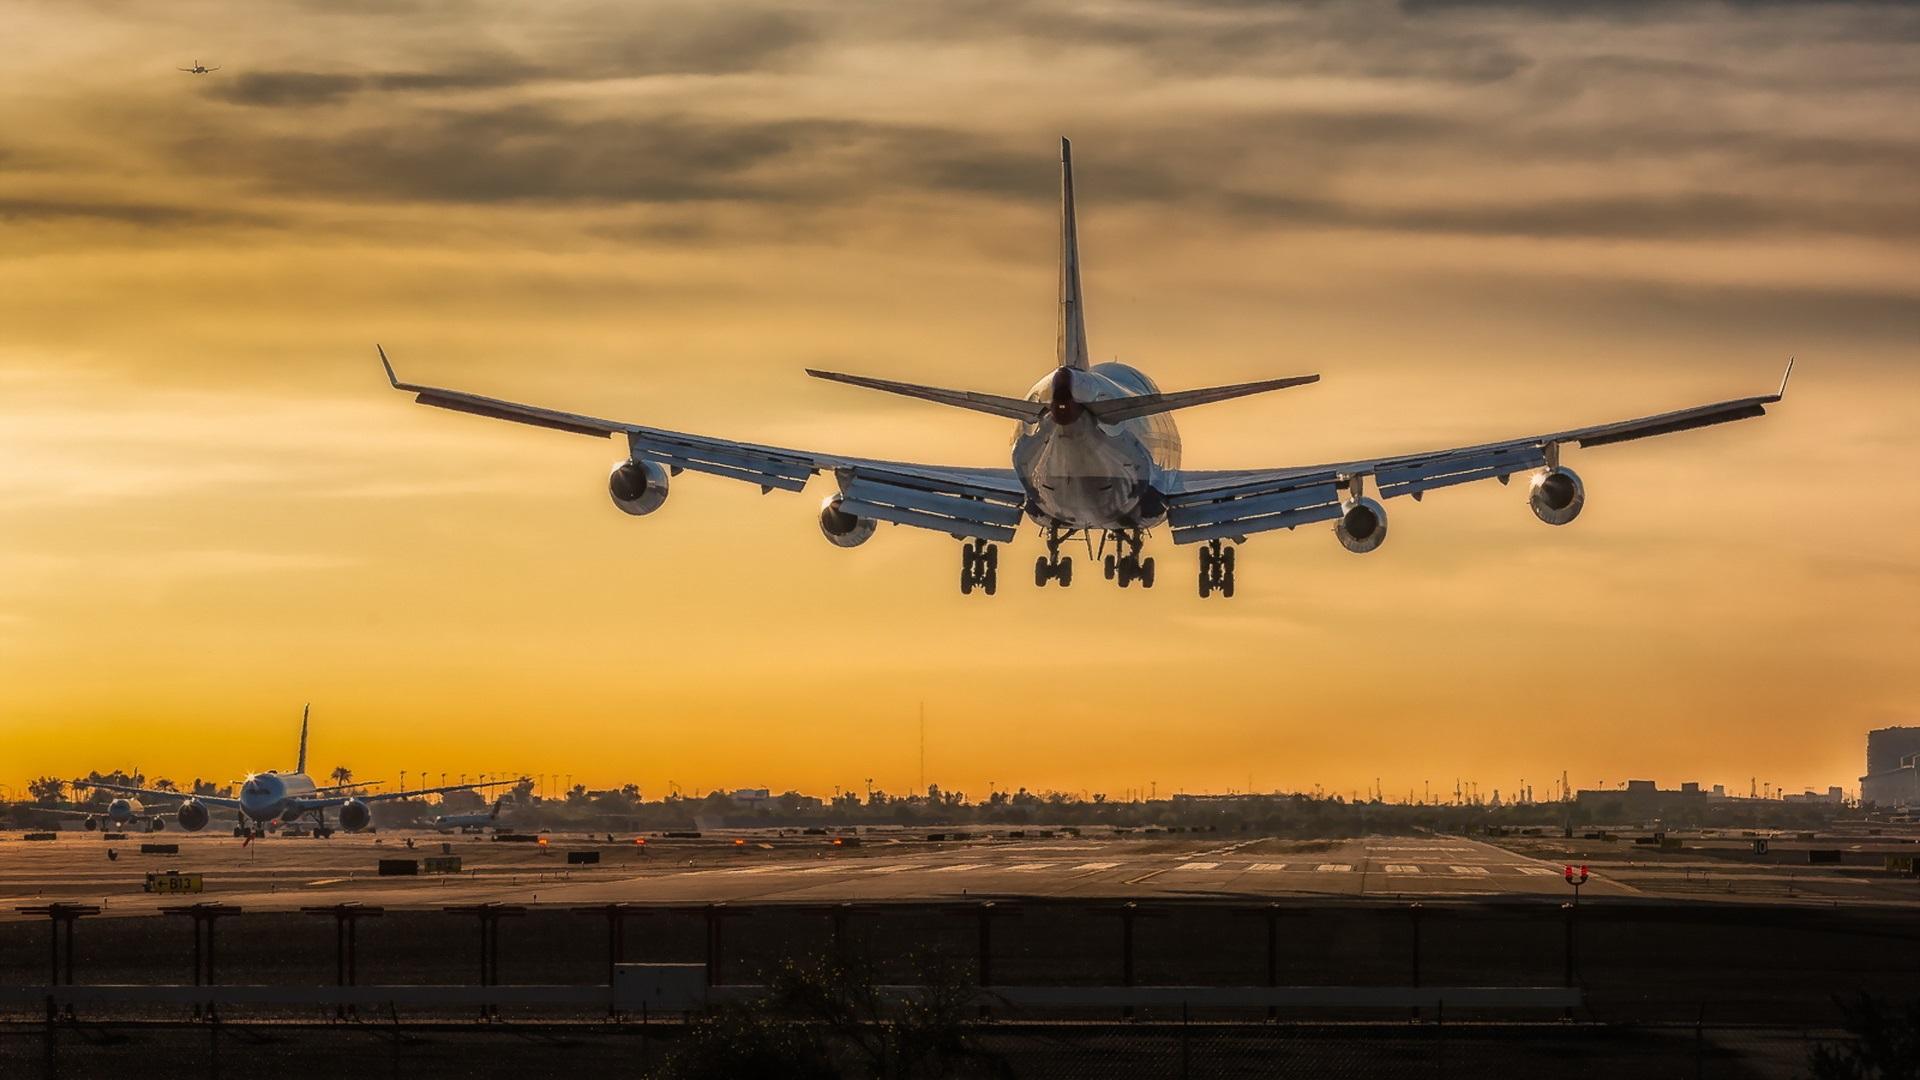 Fondos de pantalla despegue del avi n boeing 747 1920x1080 for Fondos de pantalla de aviones